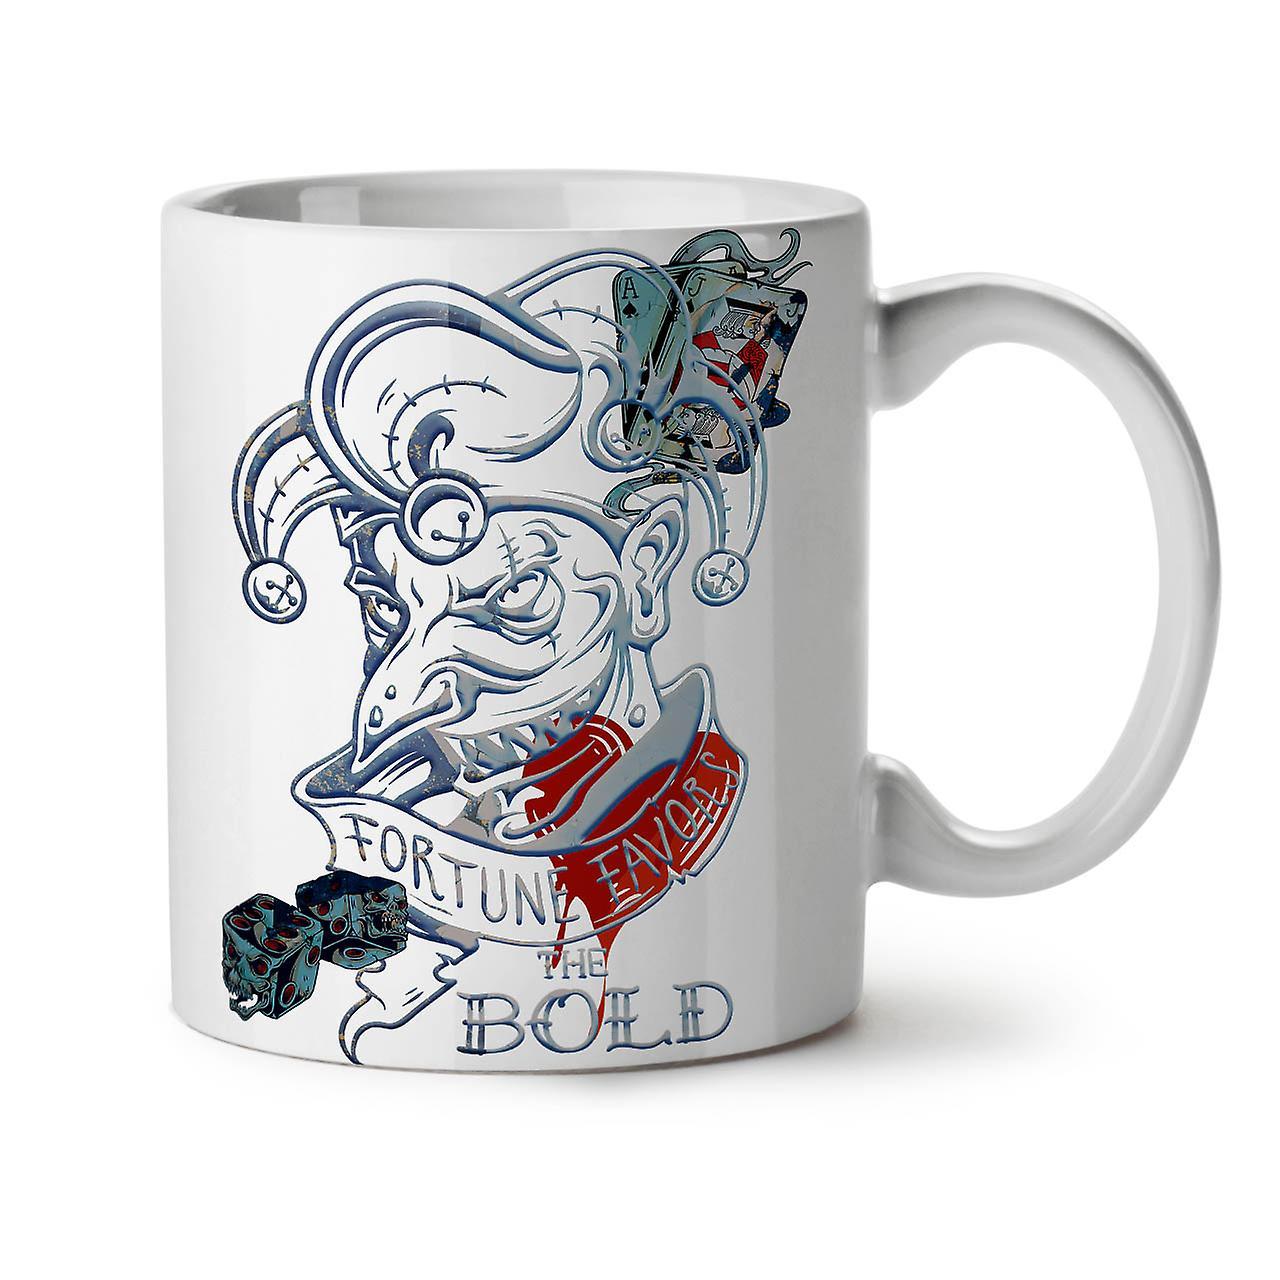 11 Gamble Coffee OzWellcoda Card Laugh Poker Mug Tea New White Ceramic QxsrtdCBh